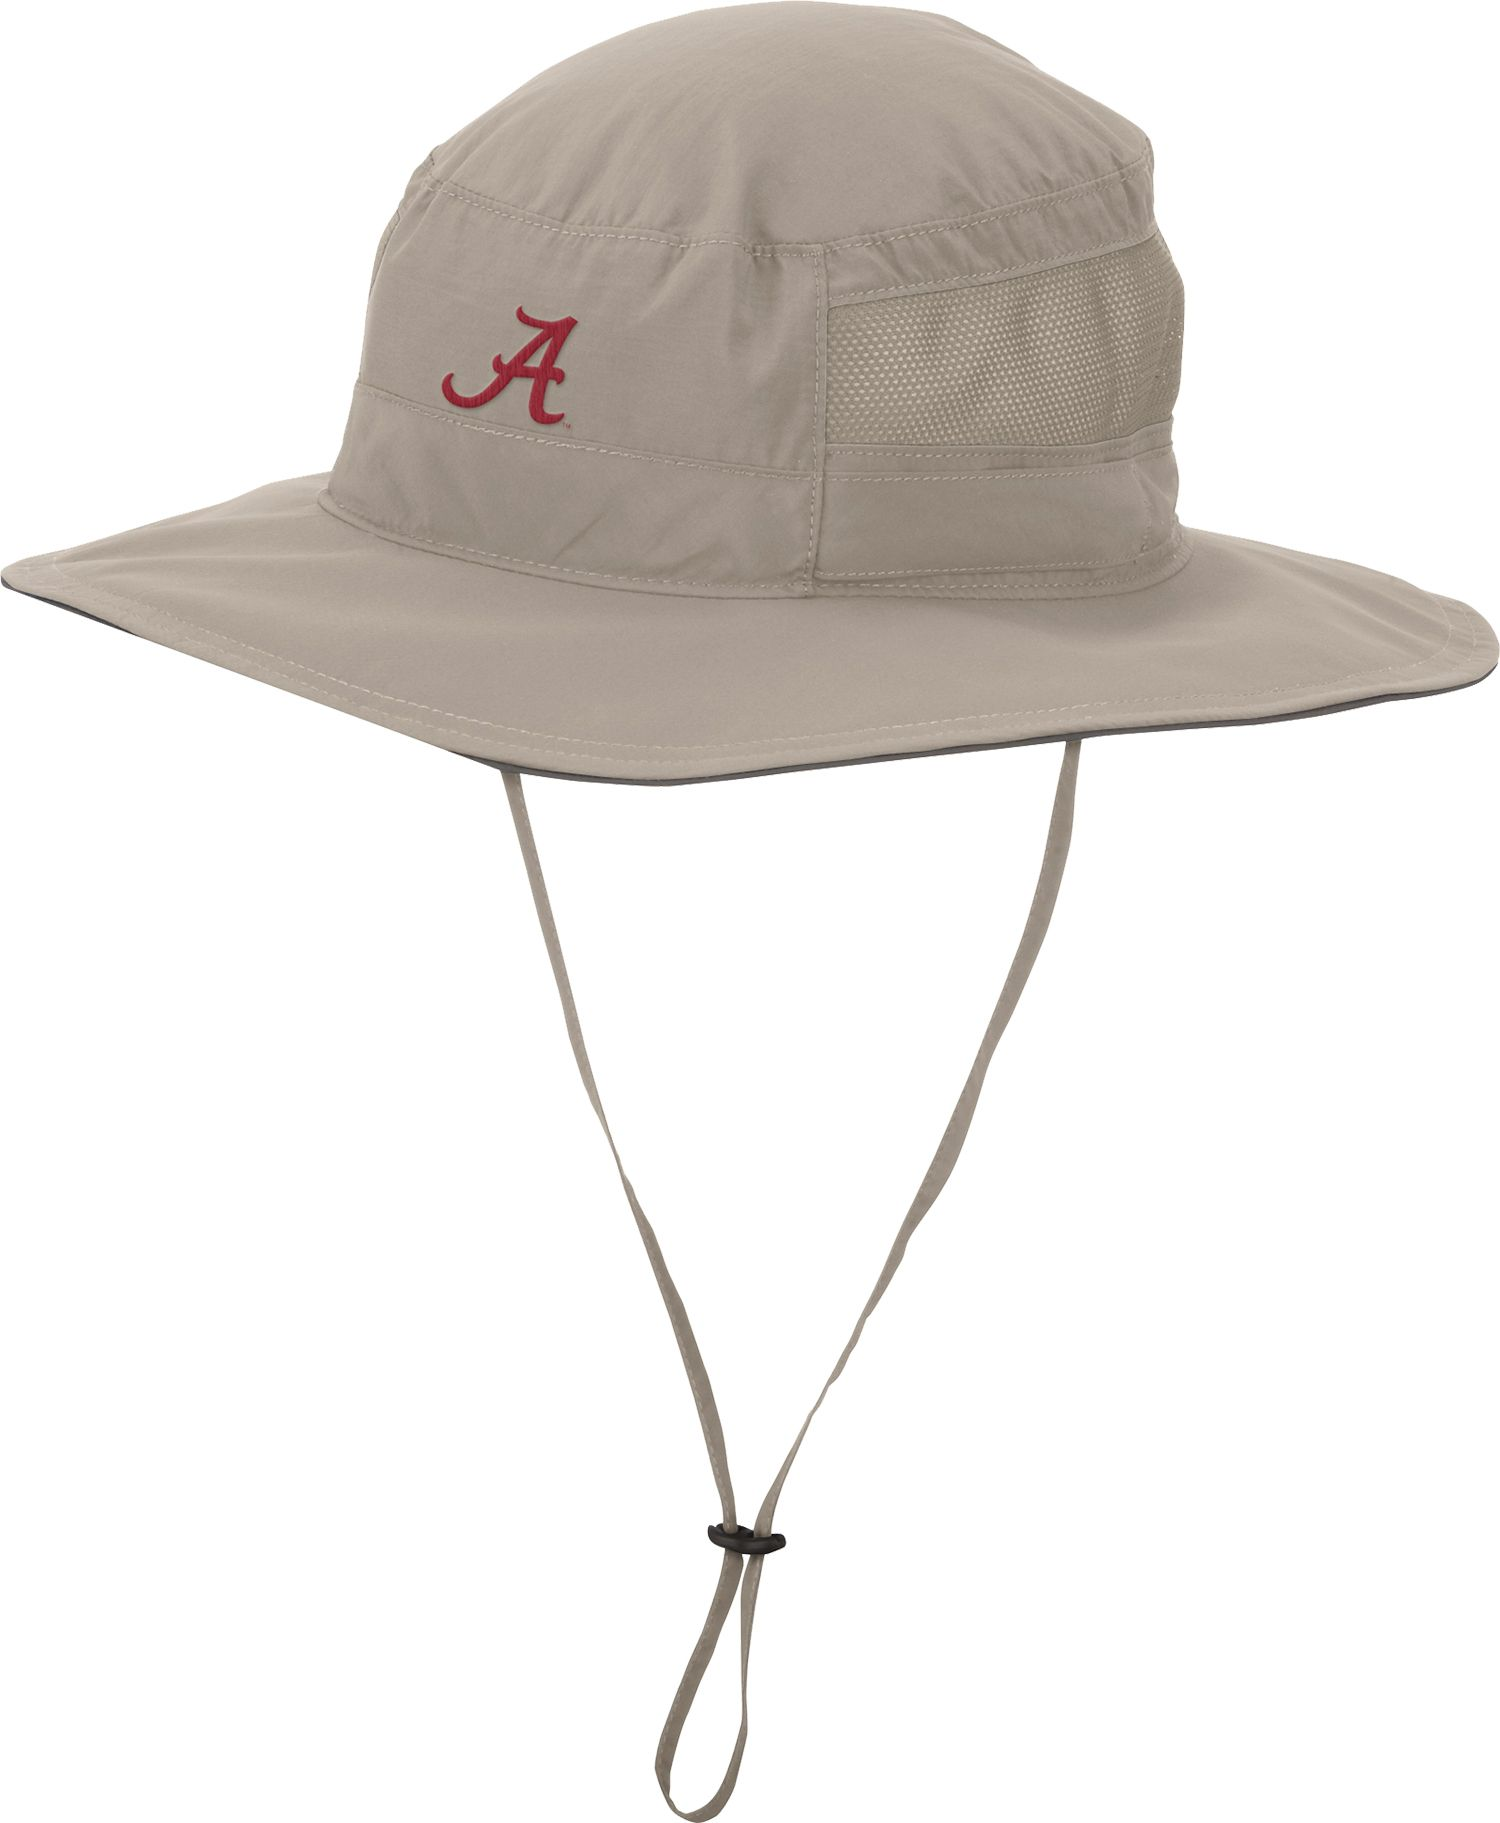 Columbia Sportswear Bora Bora Booney Ii Sun Hats: Columbia Men's Alabama Crimson Tide Khaki Bora Bora Booney